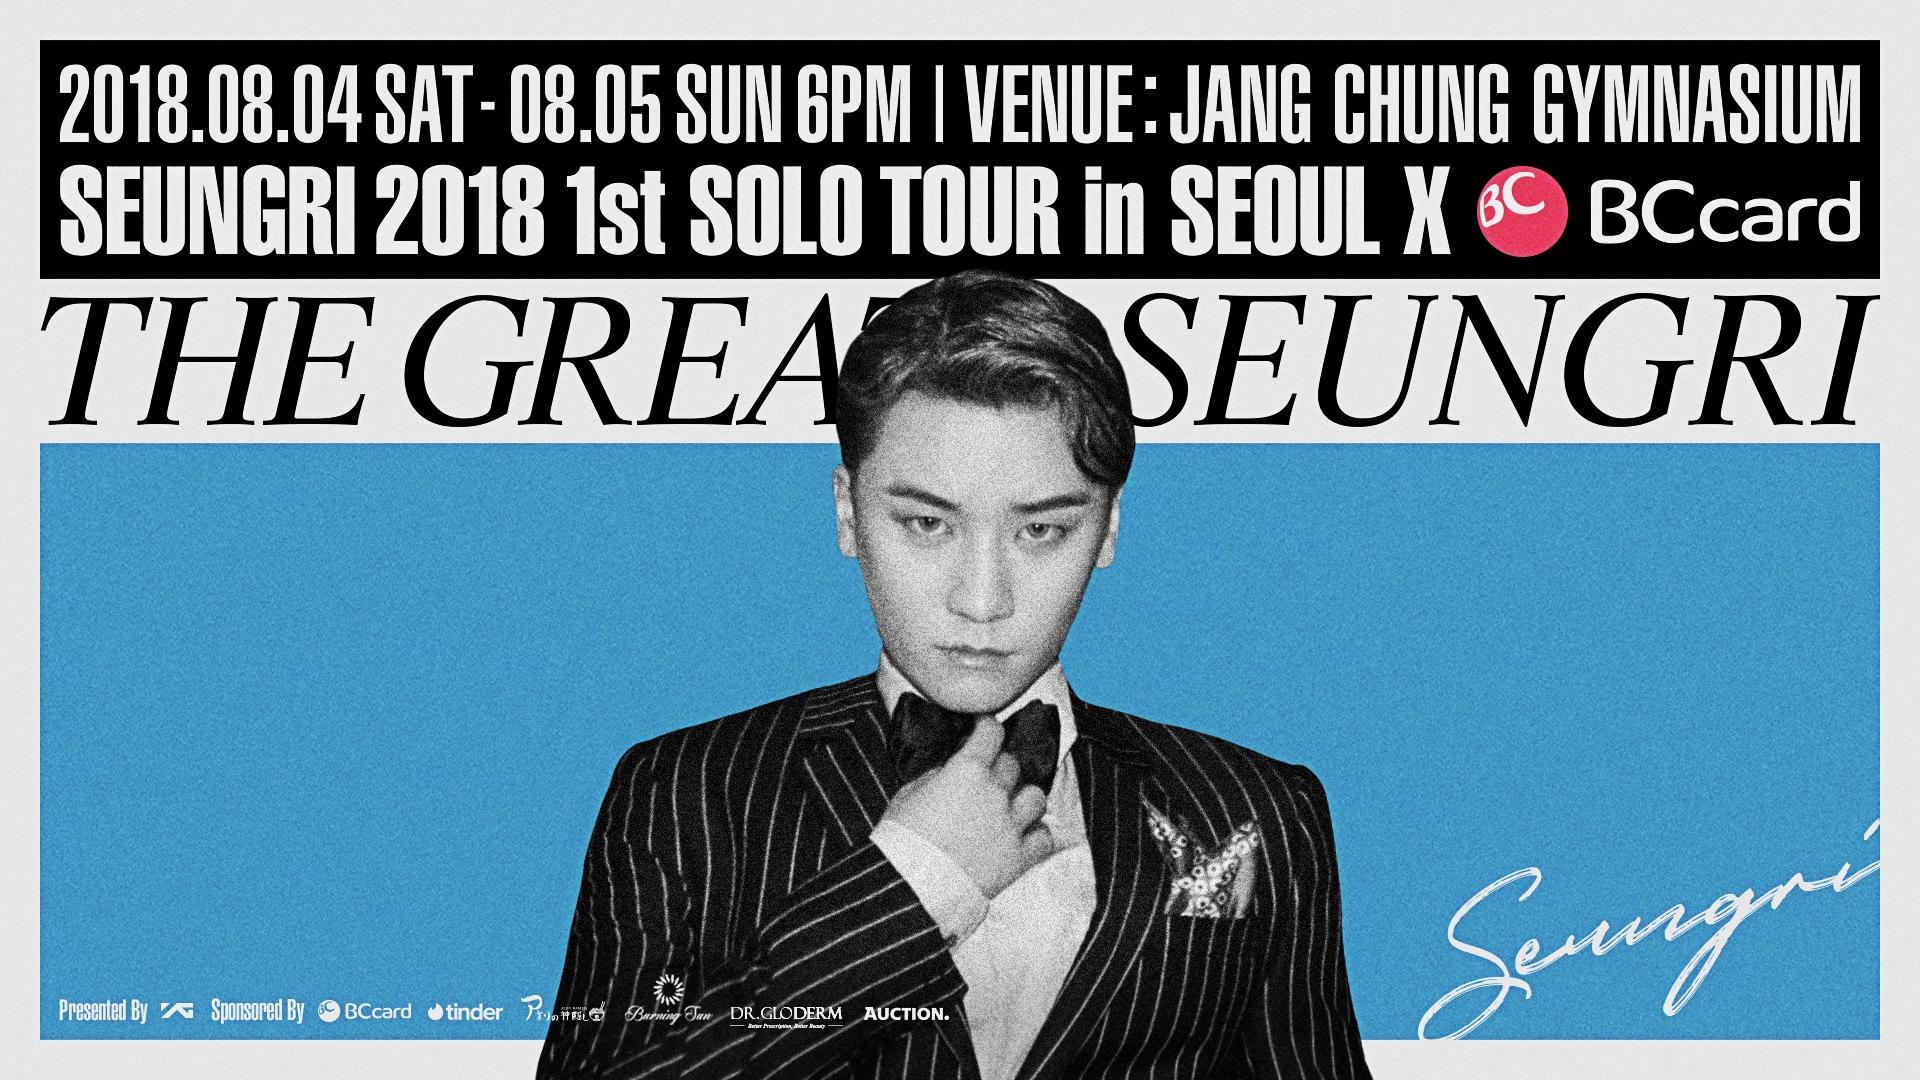 SEUNGRI - 2018 1st SOLO TOUR [THE GREAT SEUNGRI] in SEOUL #1